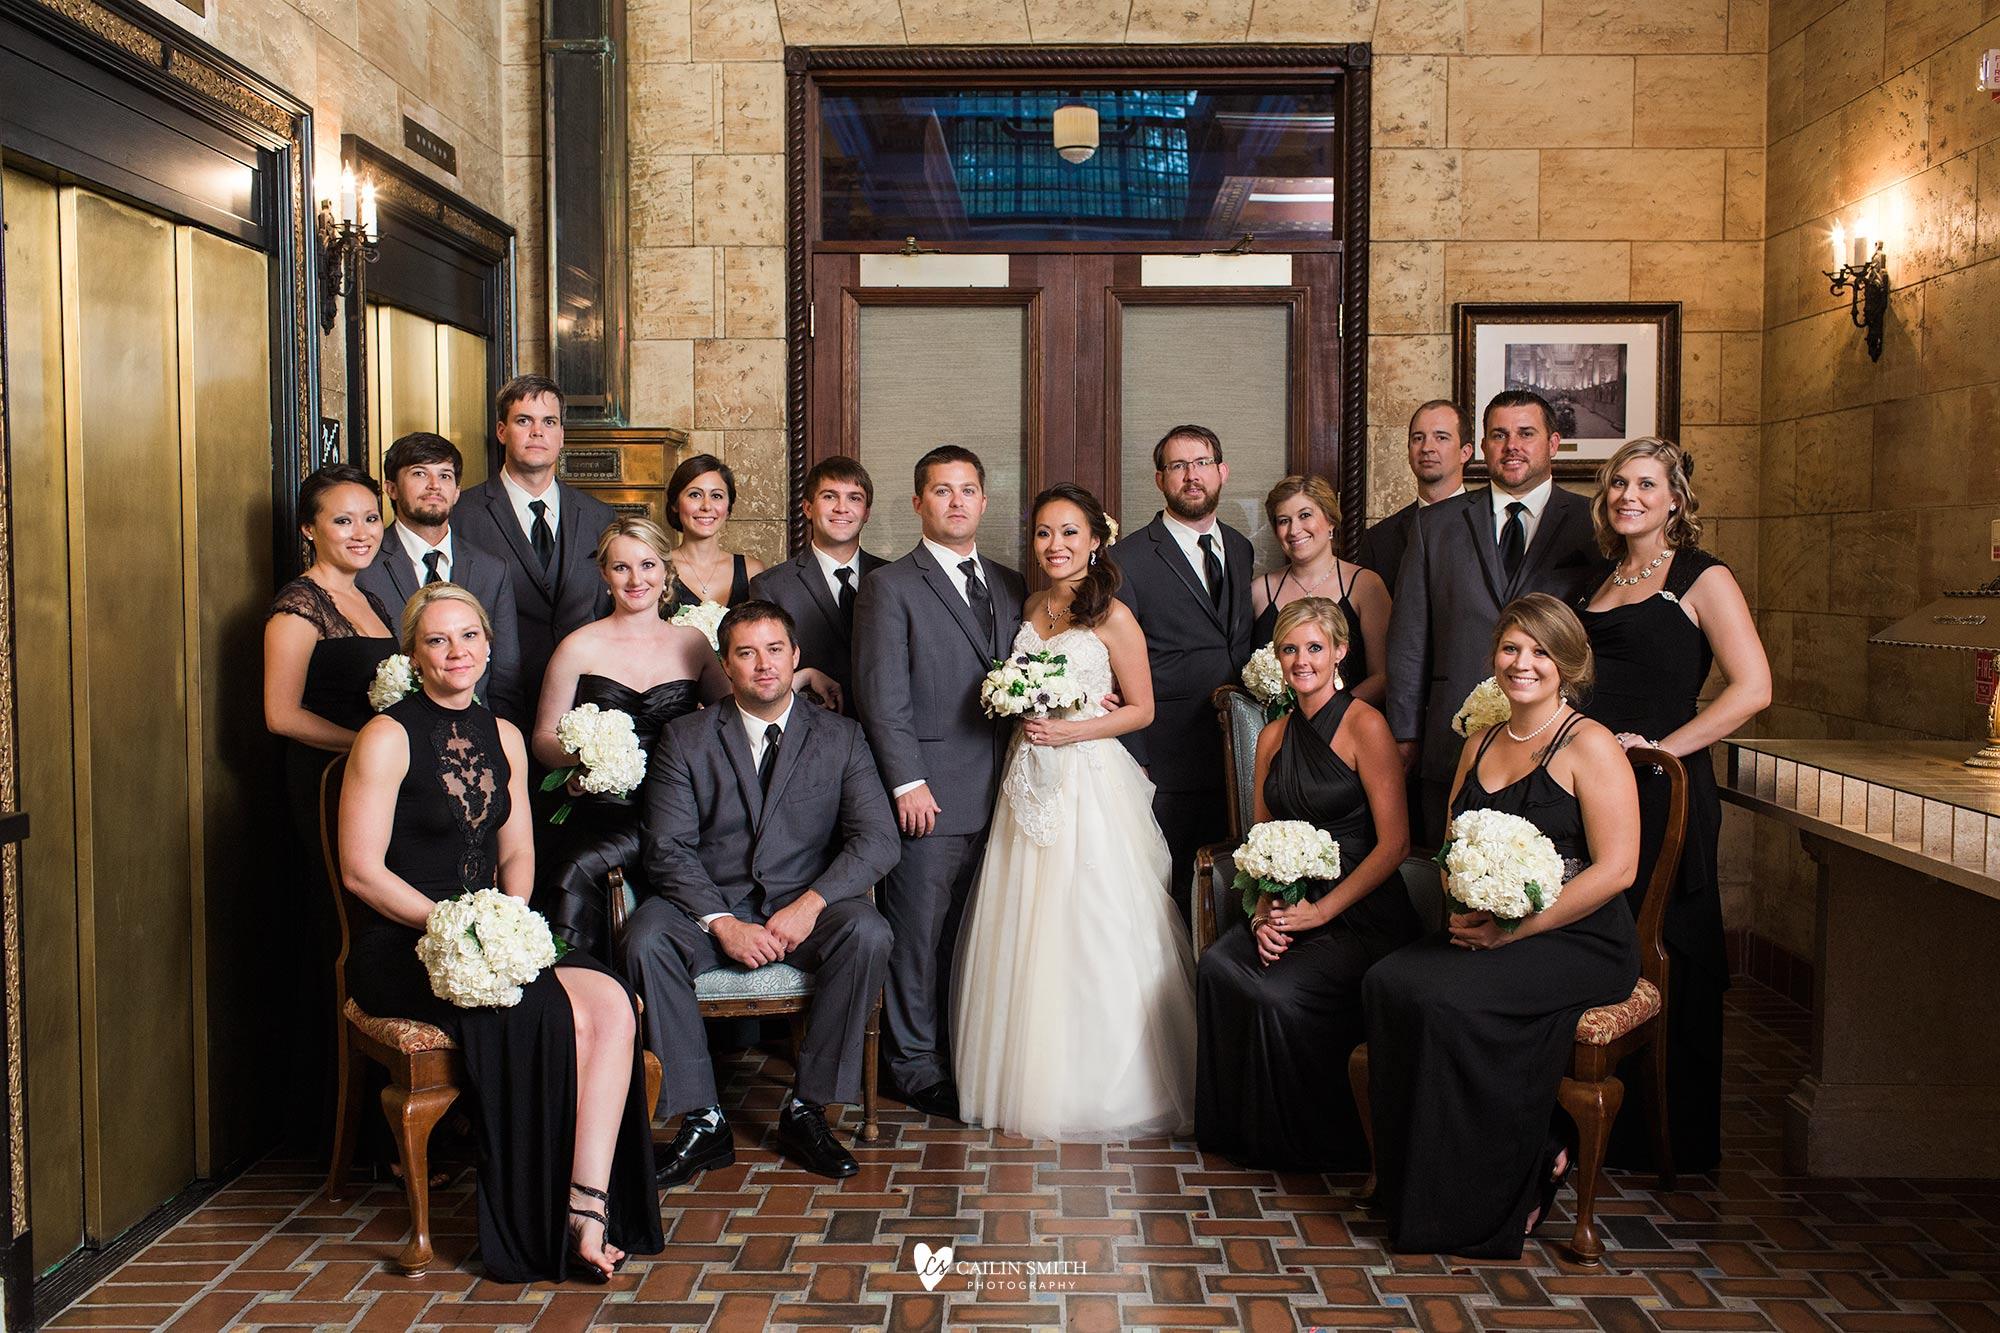 Jenifer_Dewey_Treasury_on_The_Plaza_Wedding_Photography_056.jpg